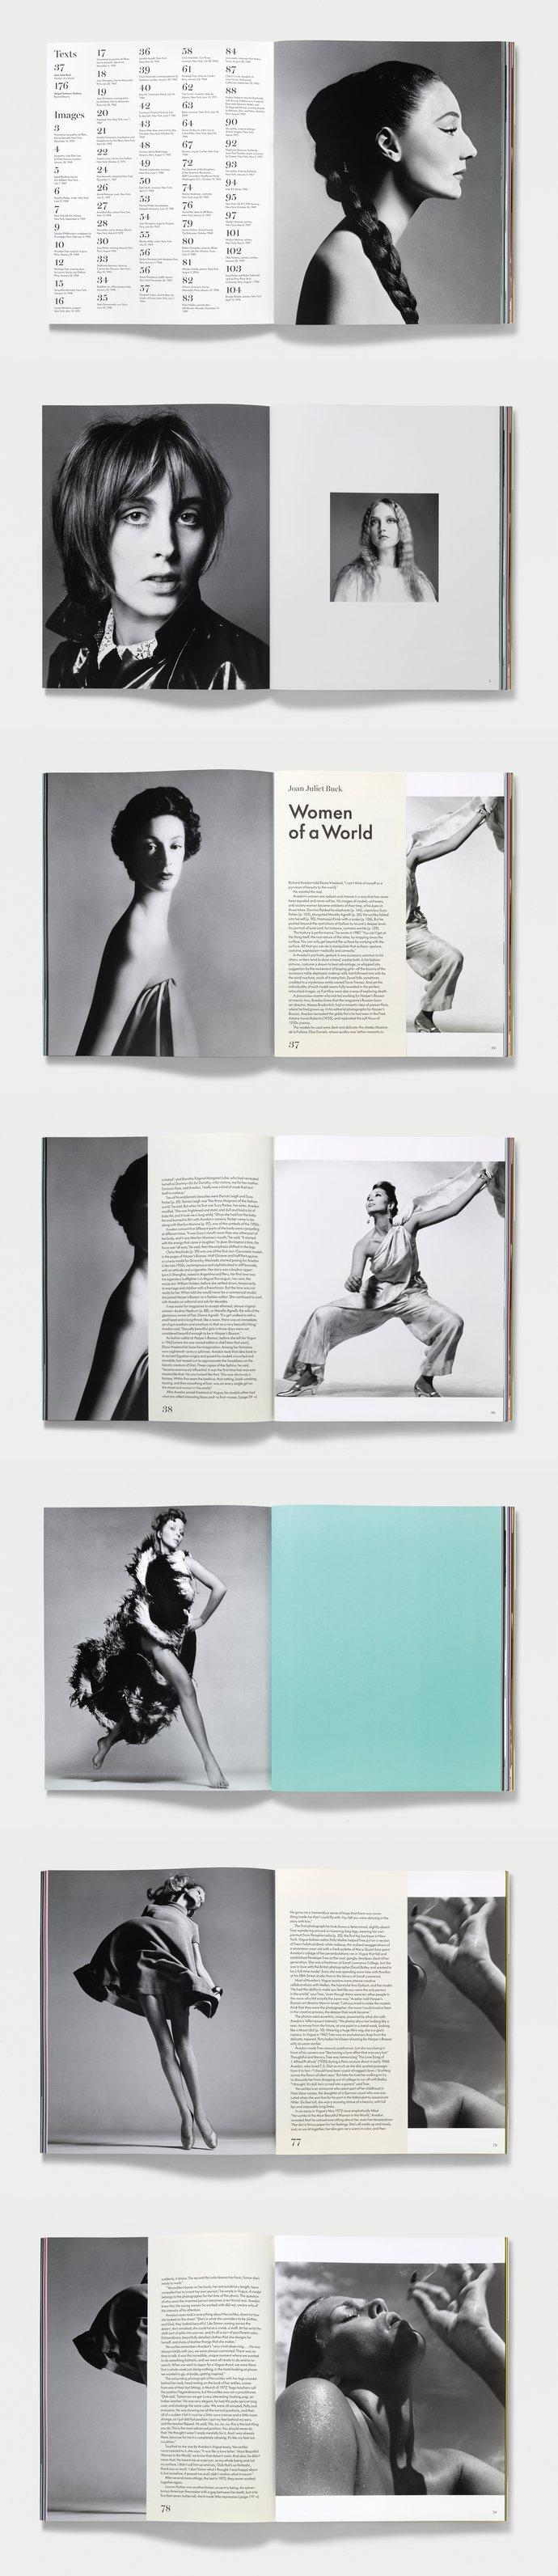 Gagosian – Avedon: Women, 2013 (Publication), image 3